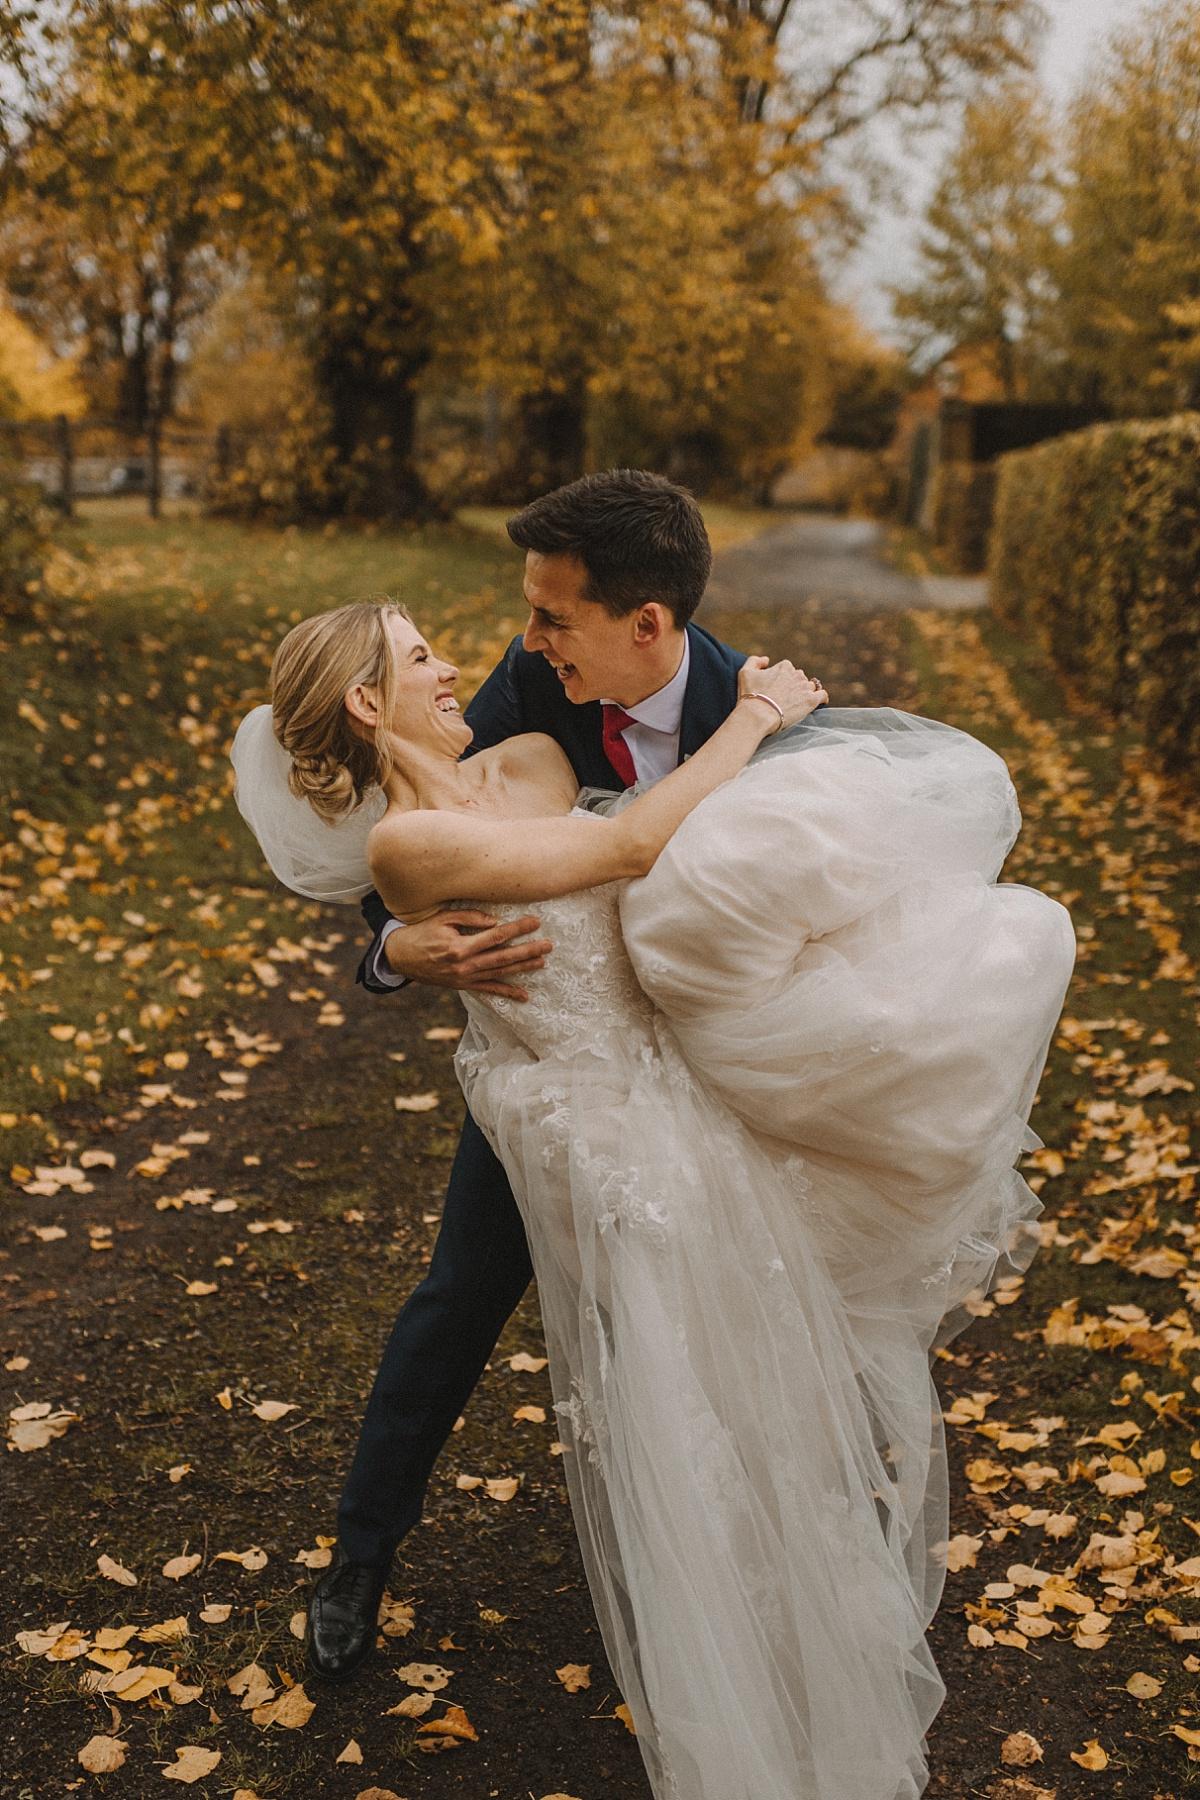 Groom dancing with bride outside of Barn